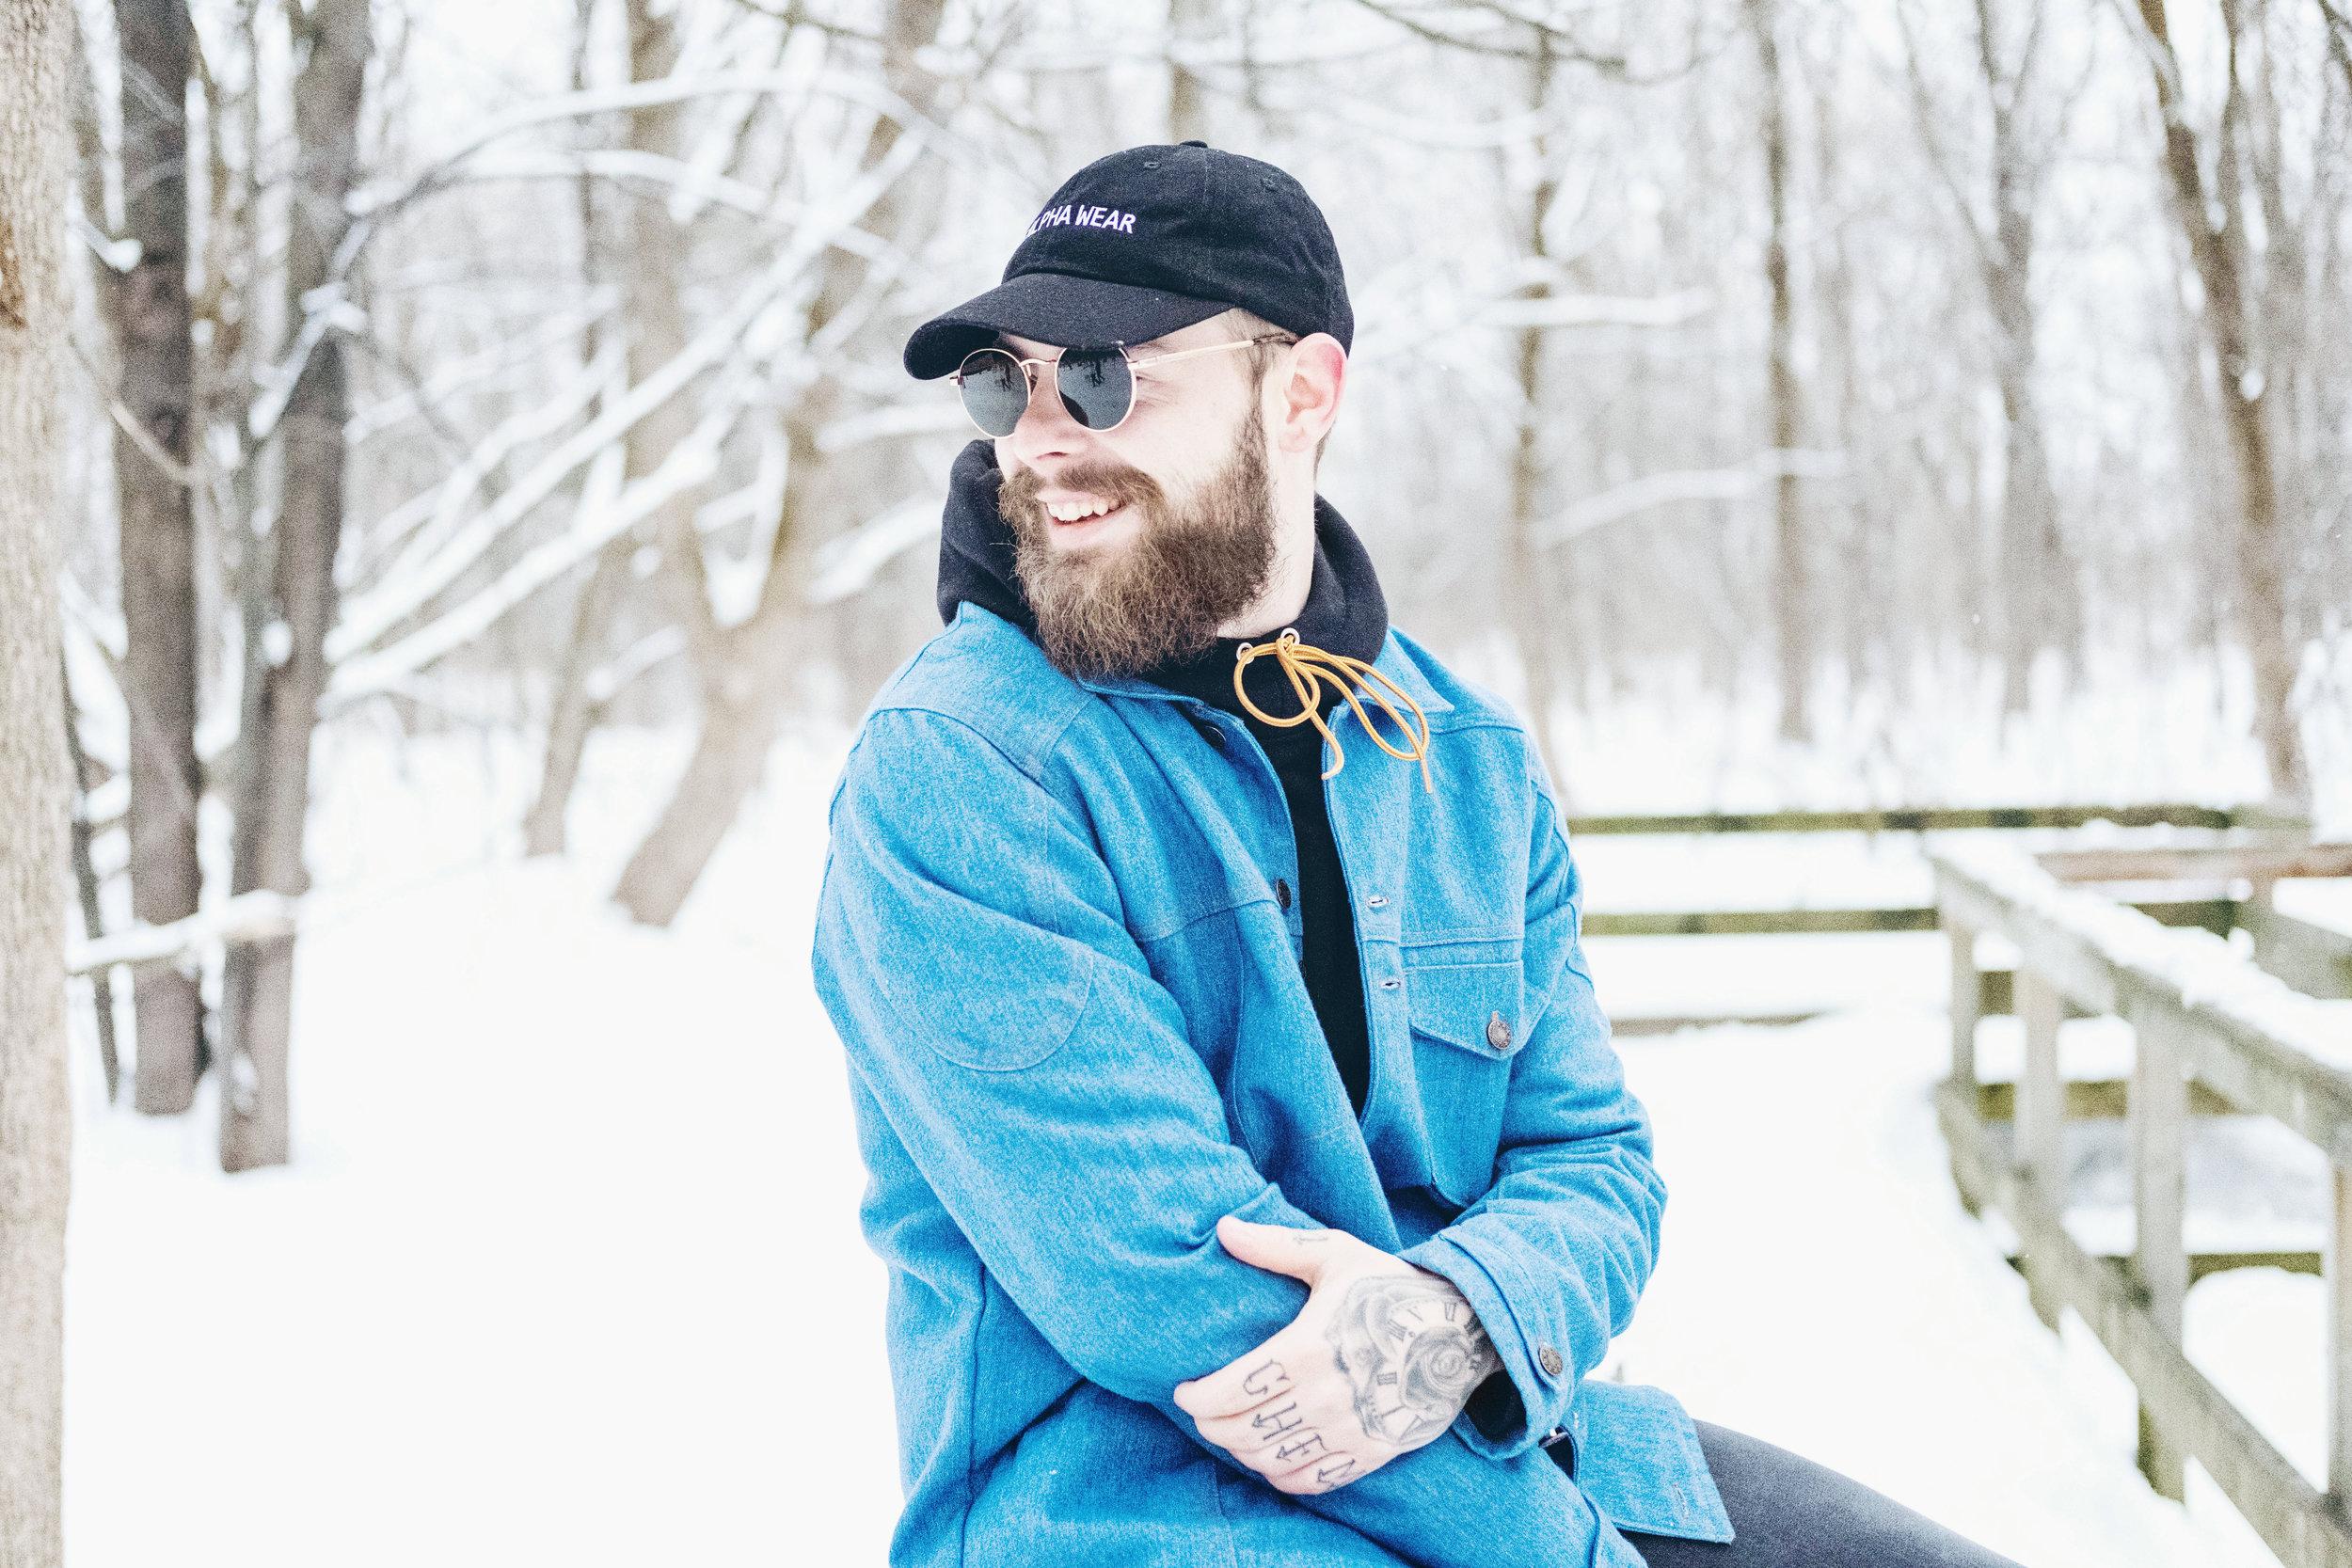 MB Alpha Wear is a Montreal designer